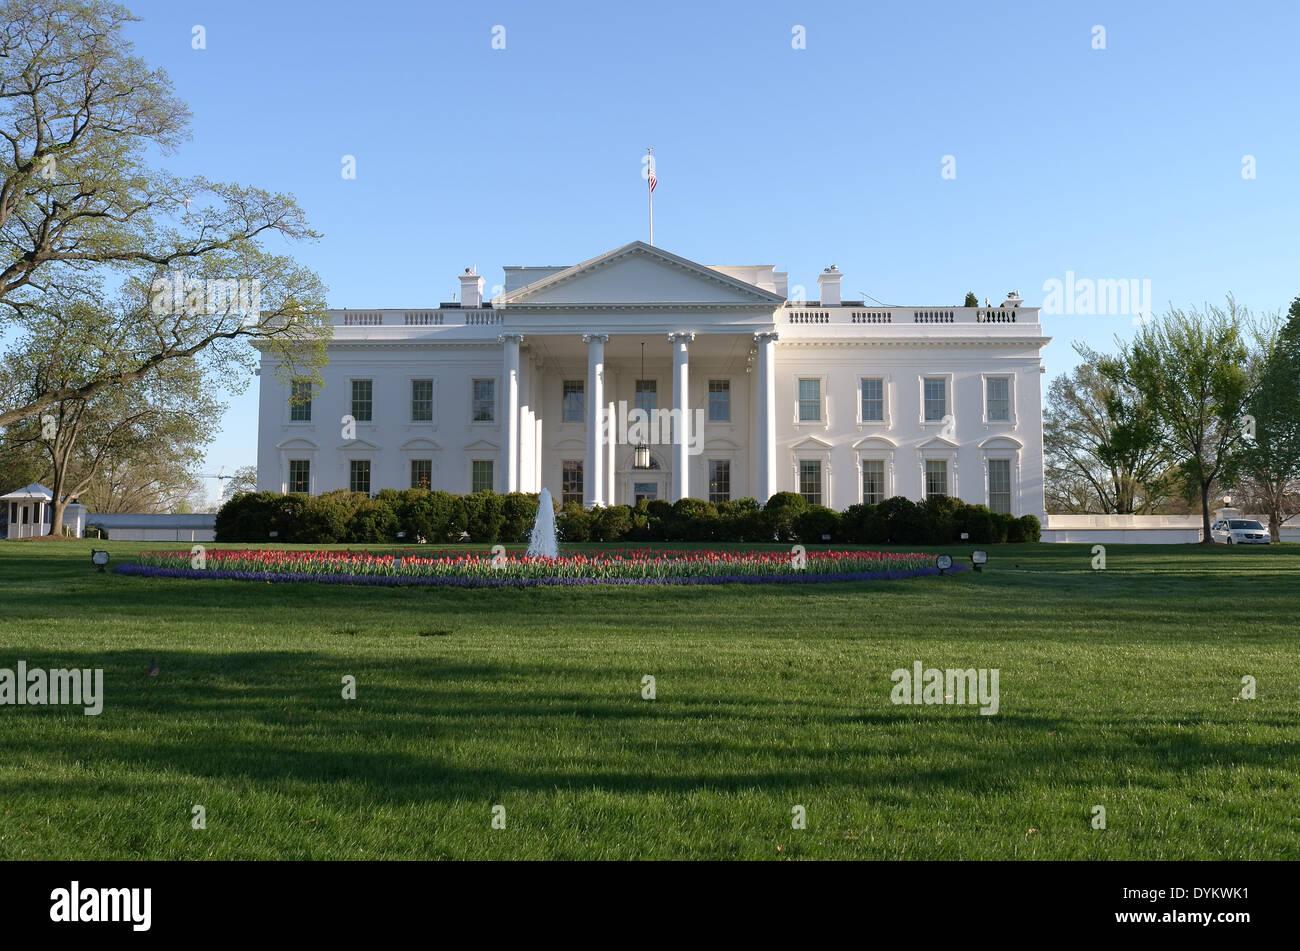 The White House, Washington. D.C. - Stock Image